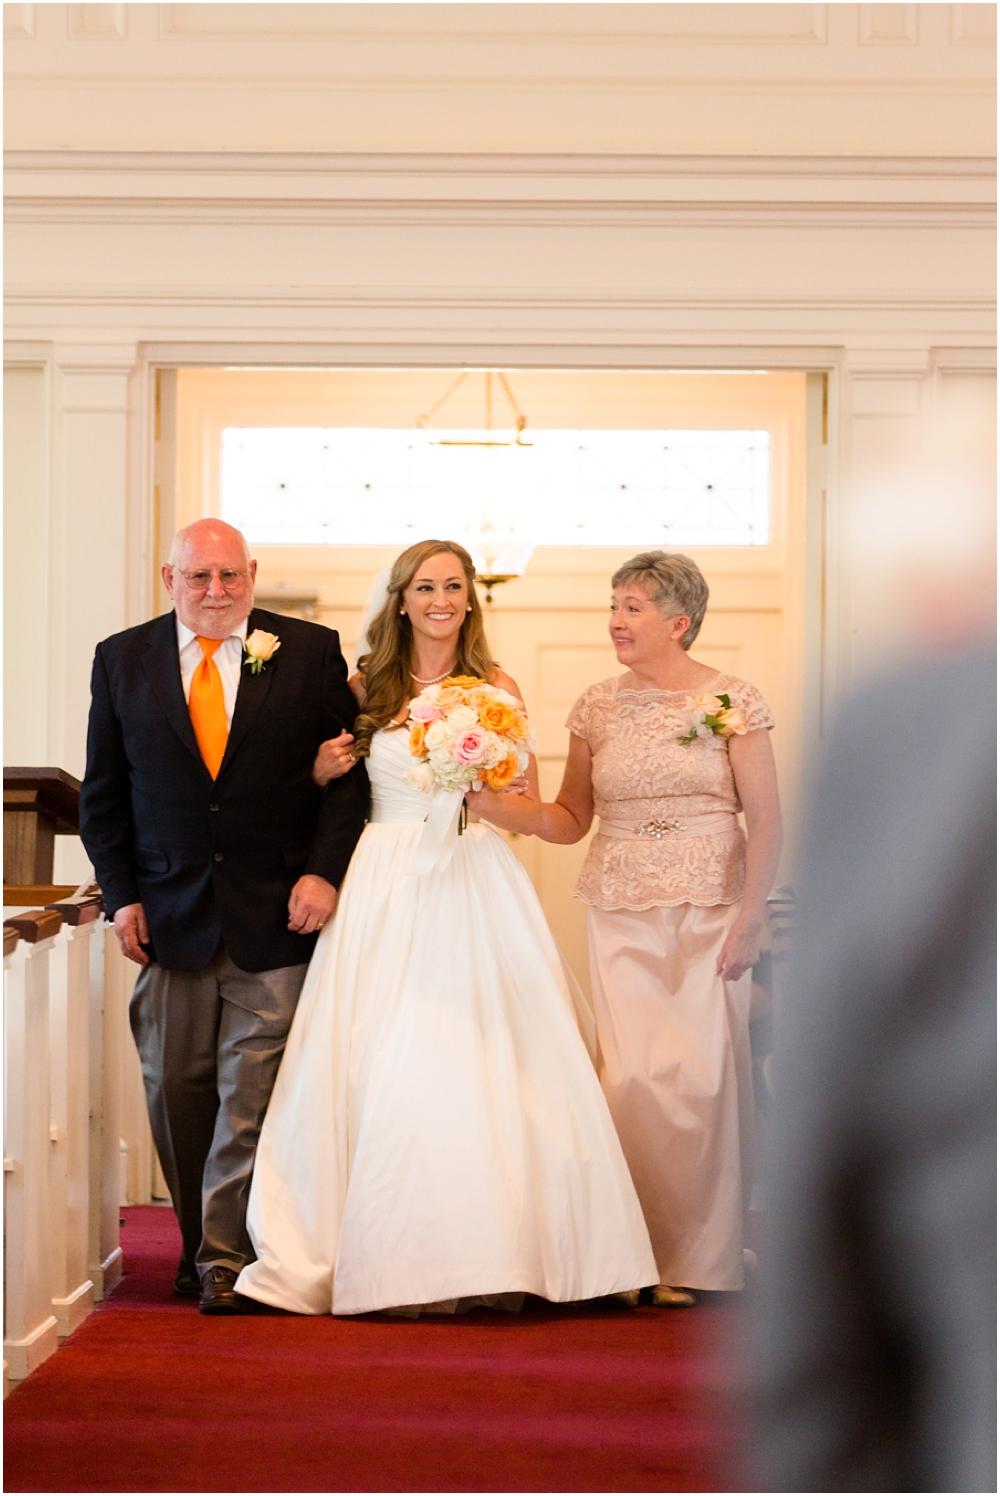 hudspeth_chesapeake_bay_beach_club_wedding_eastern_shore_wedding_photographer_0041